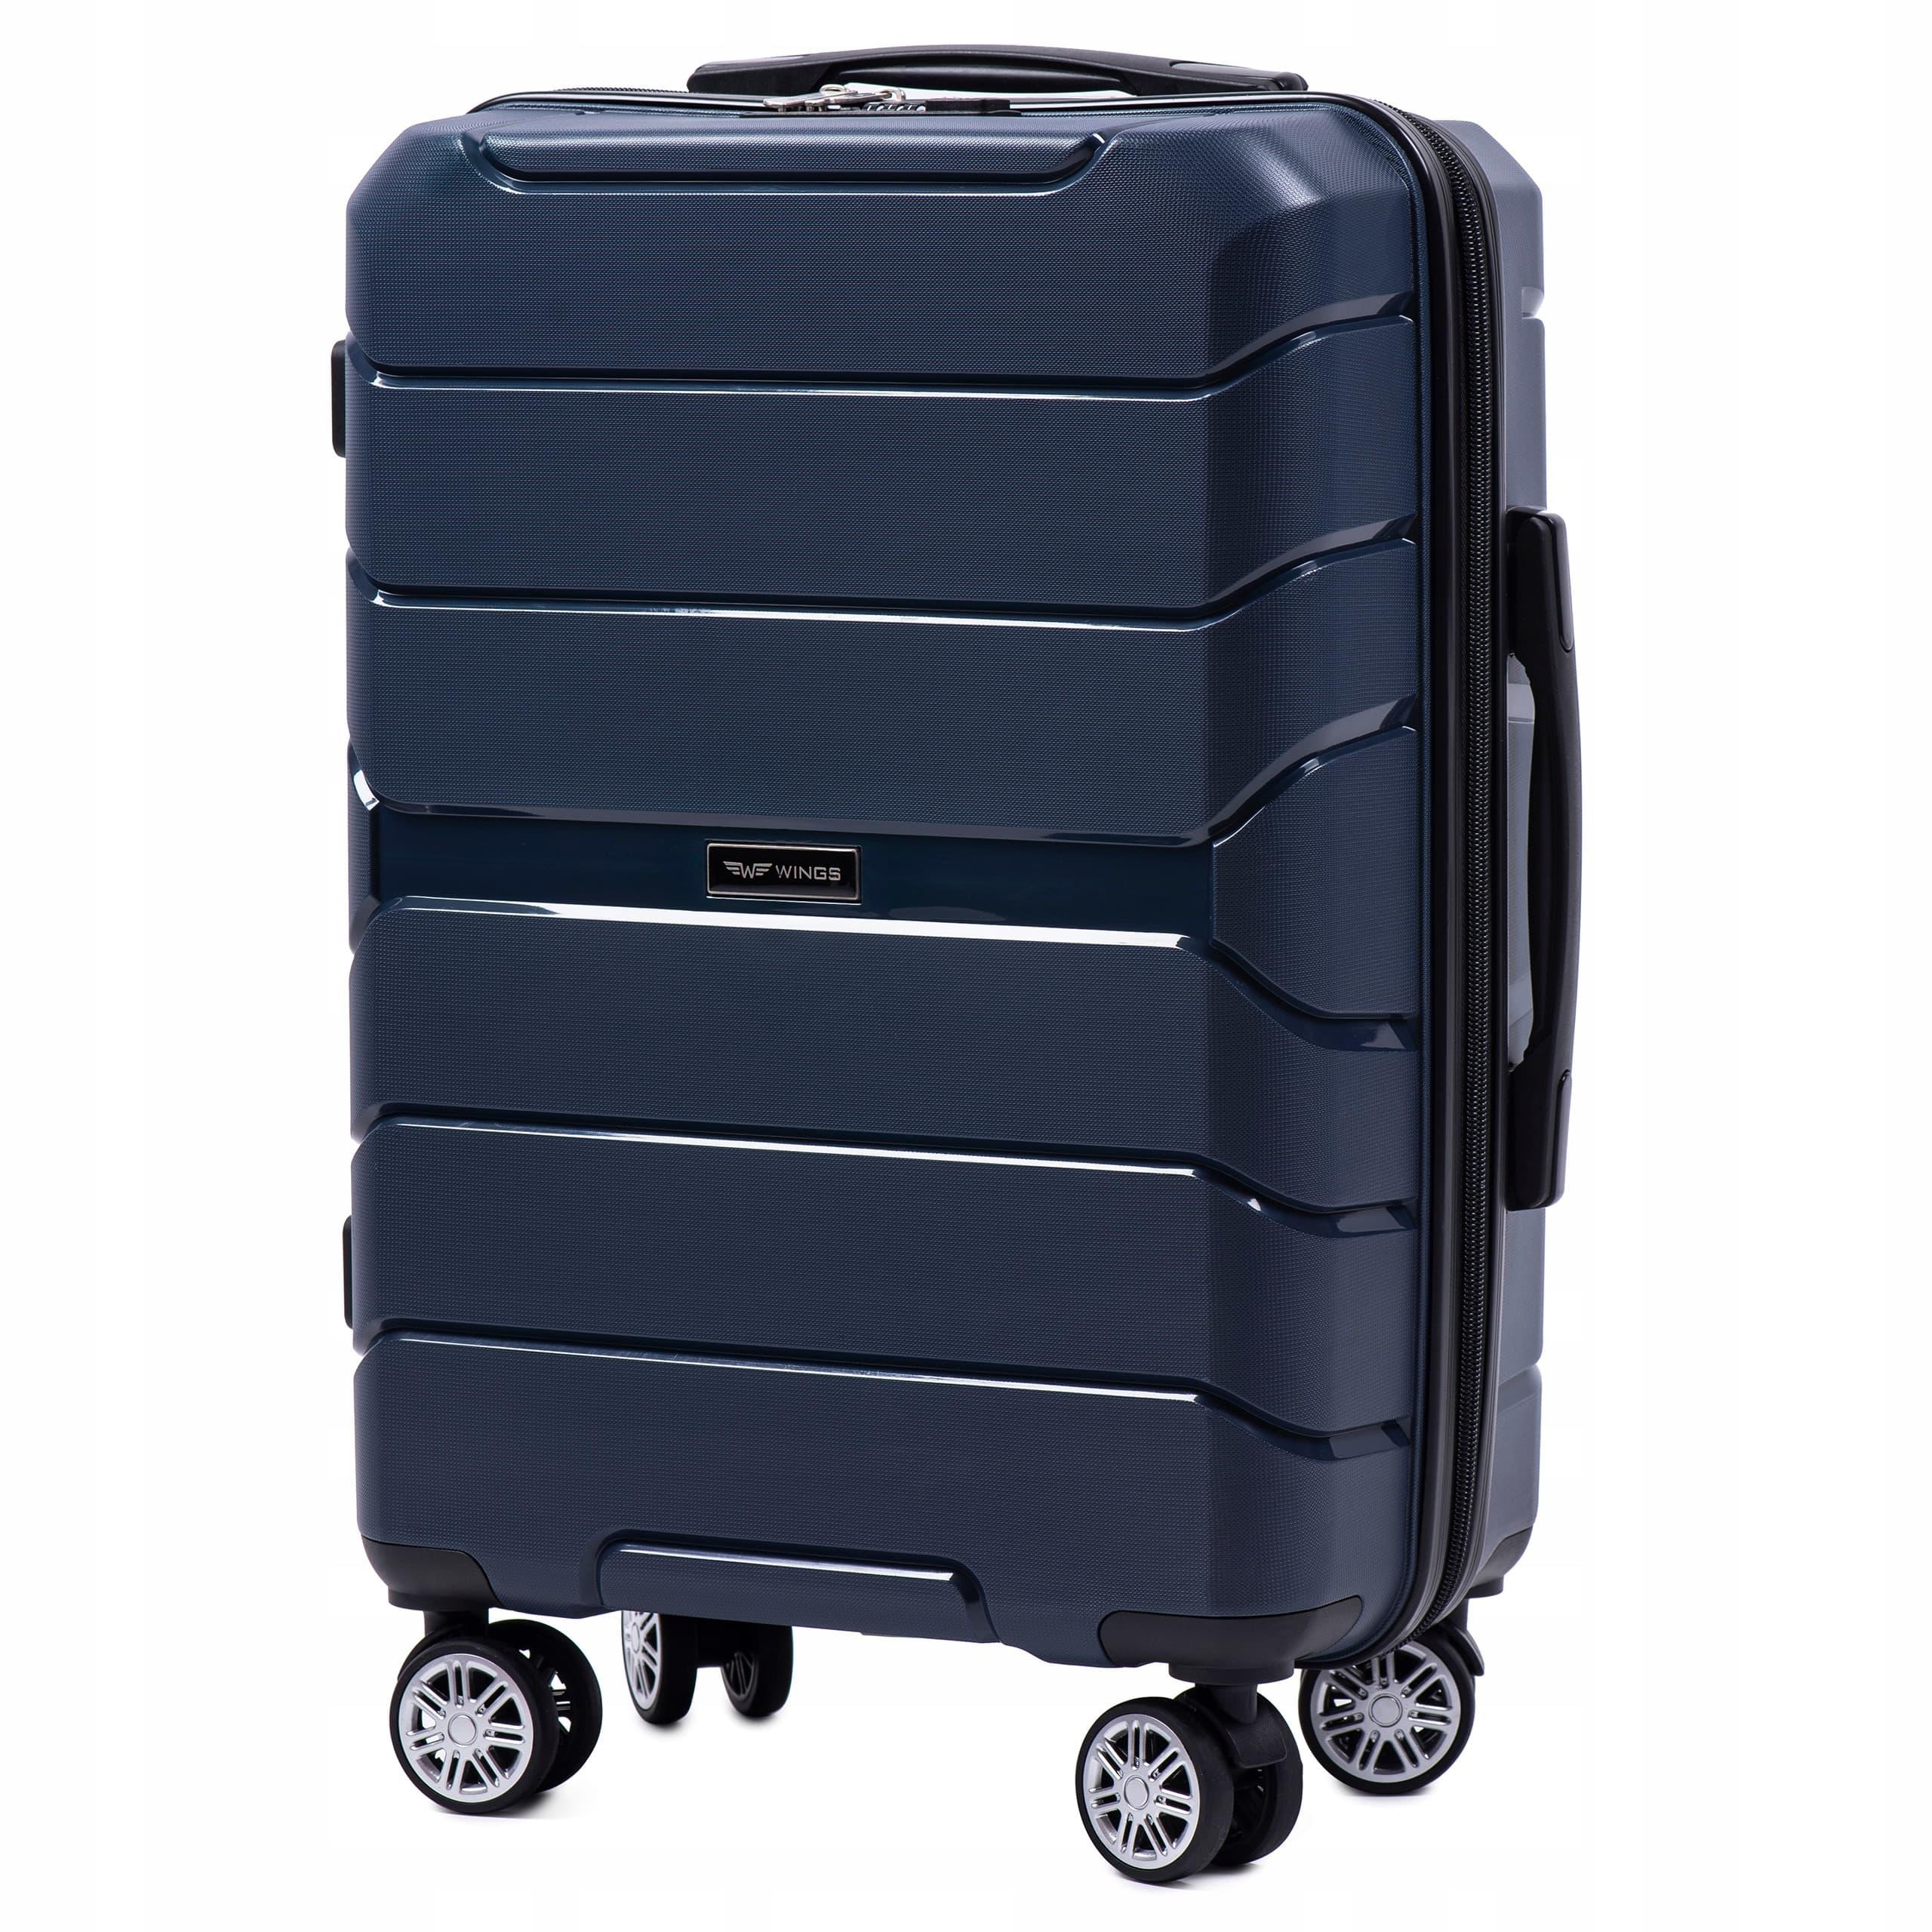 Valiza mica din polipropilena pe 4 roti WINGS PP-05 S BLUE Pt bagaj de maina,7/10 kg